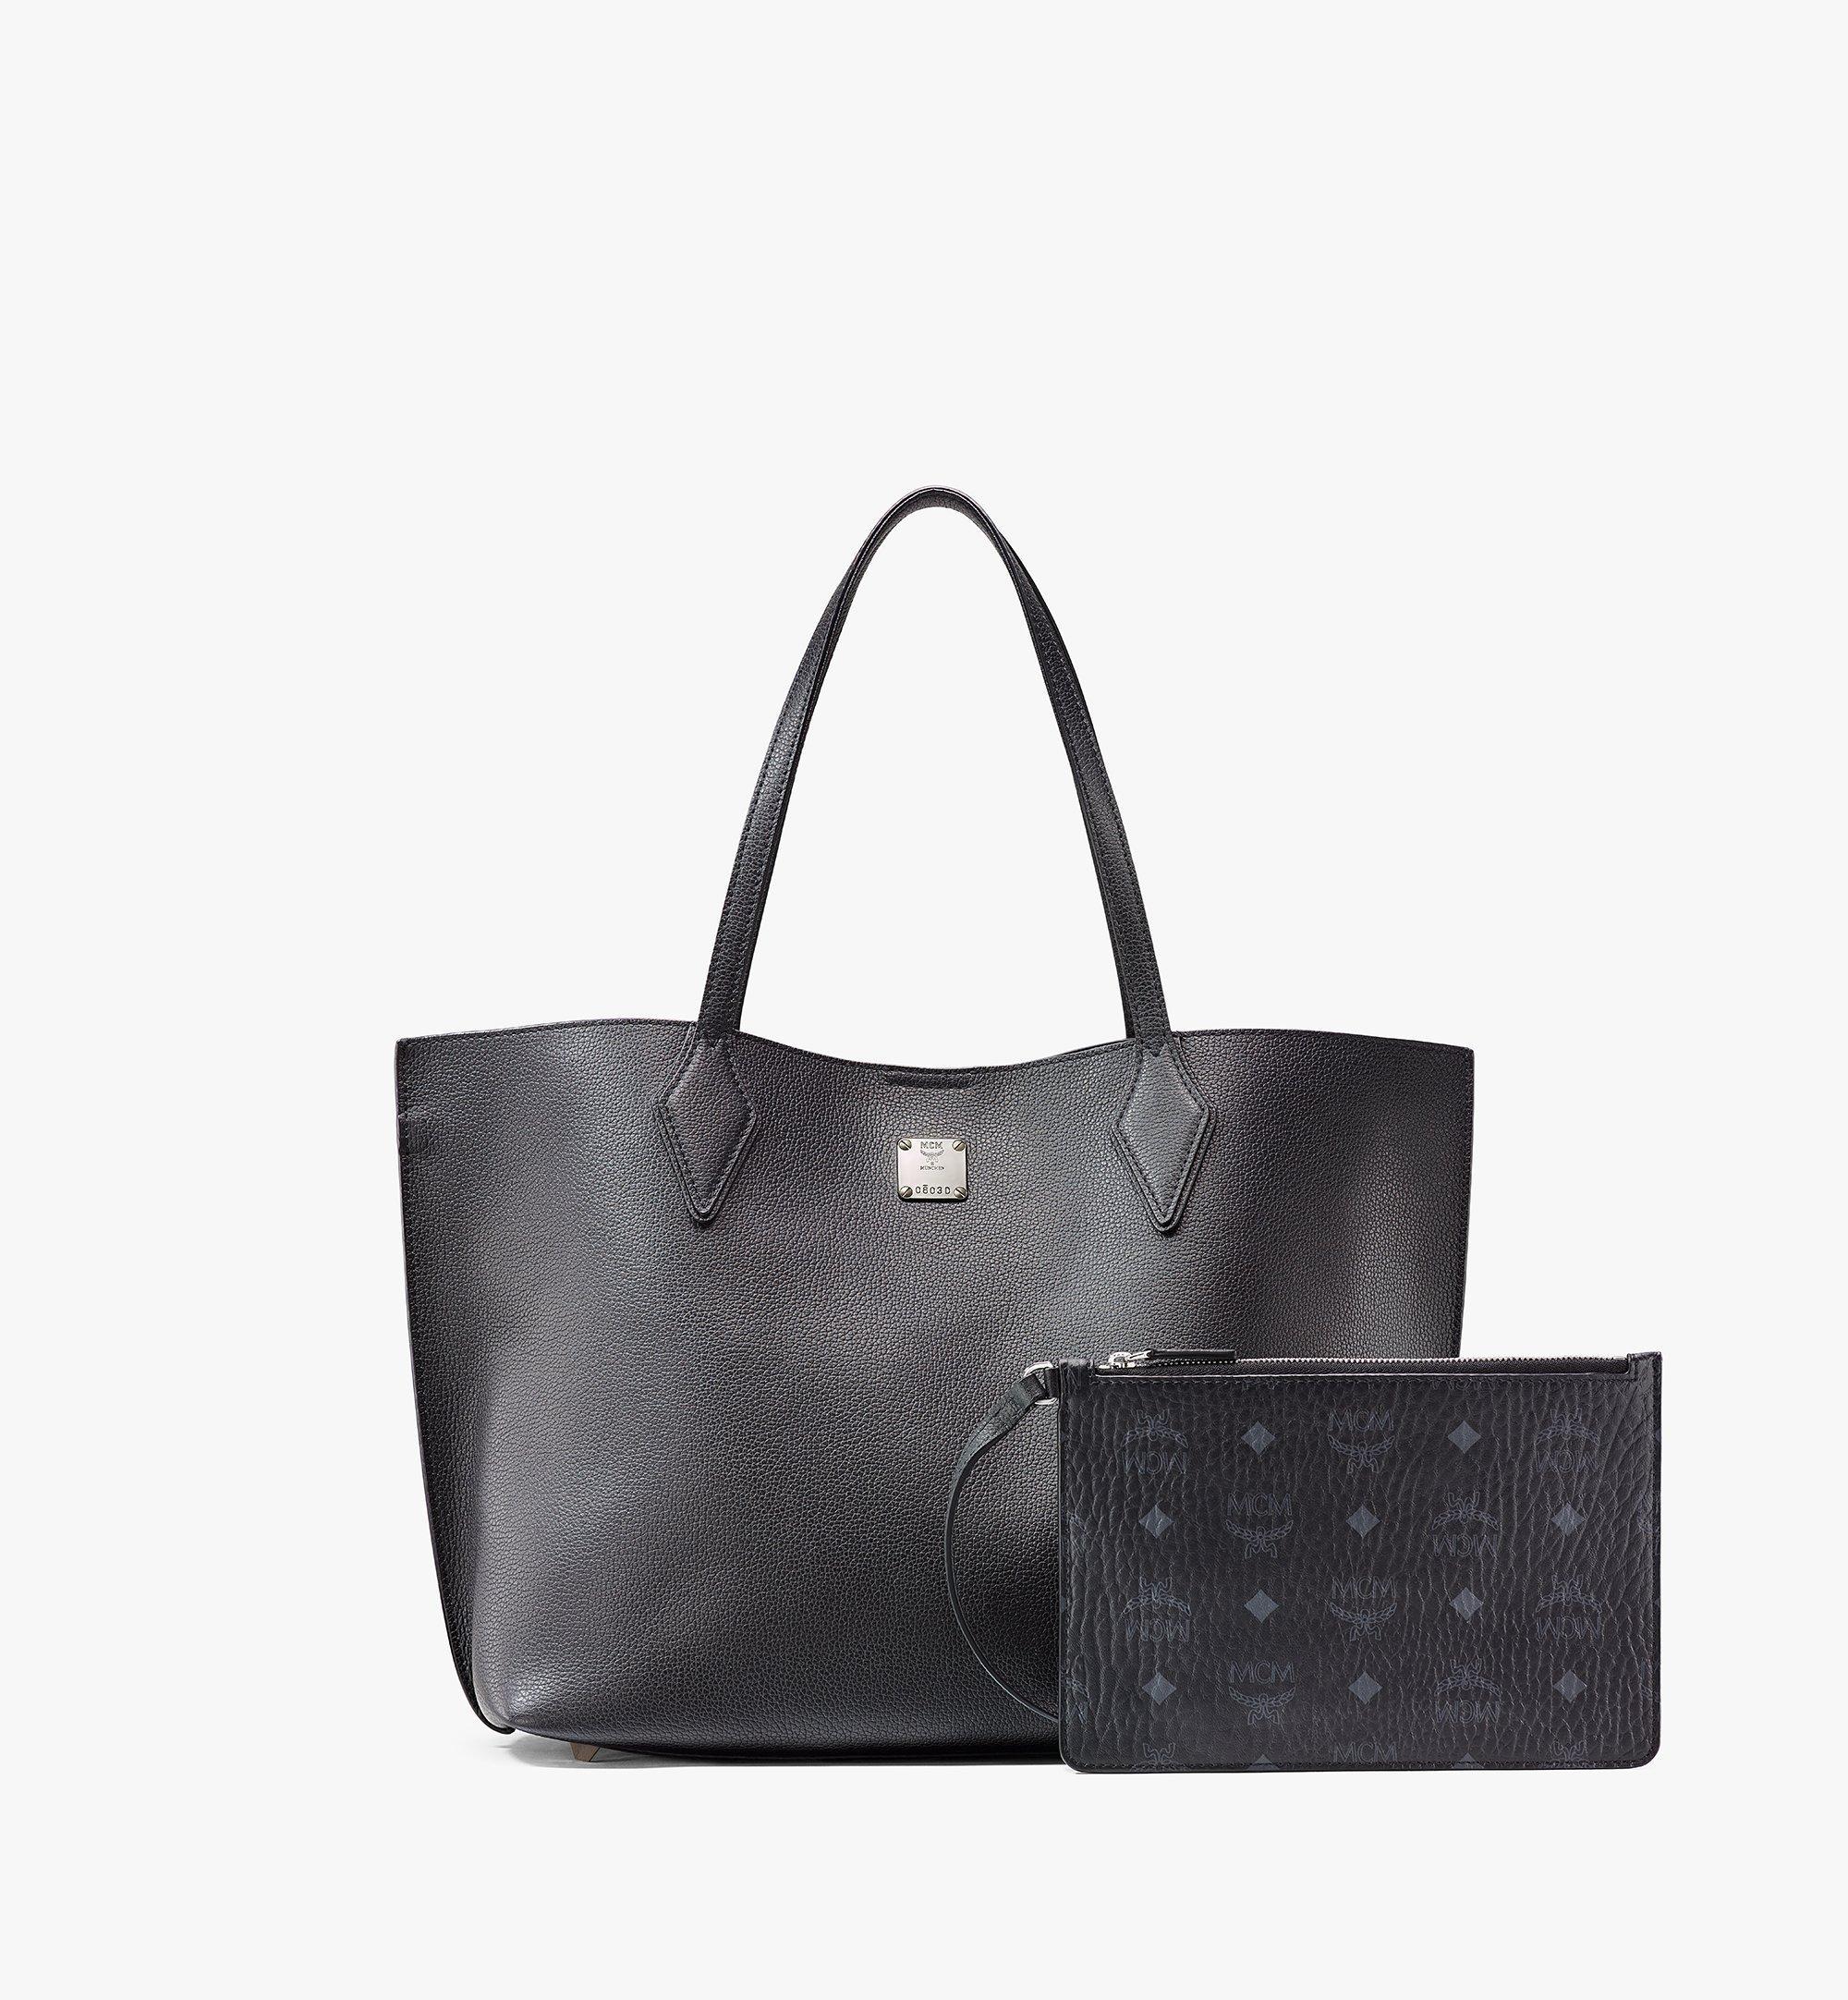 MCM Yris Tani 皮革購物袋 Black MWPAAYS01BK001 更多視圖 4